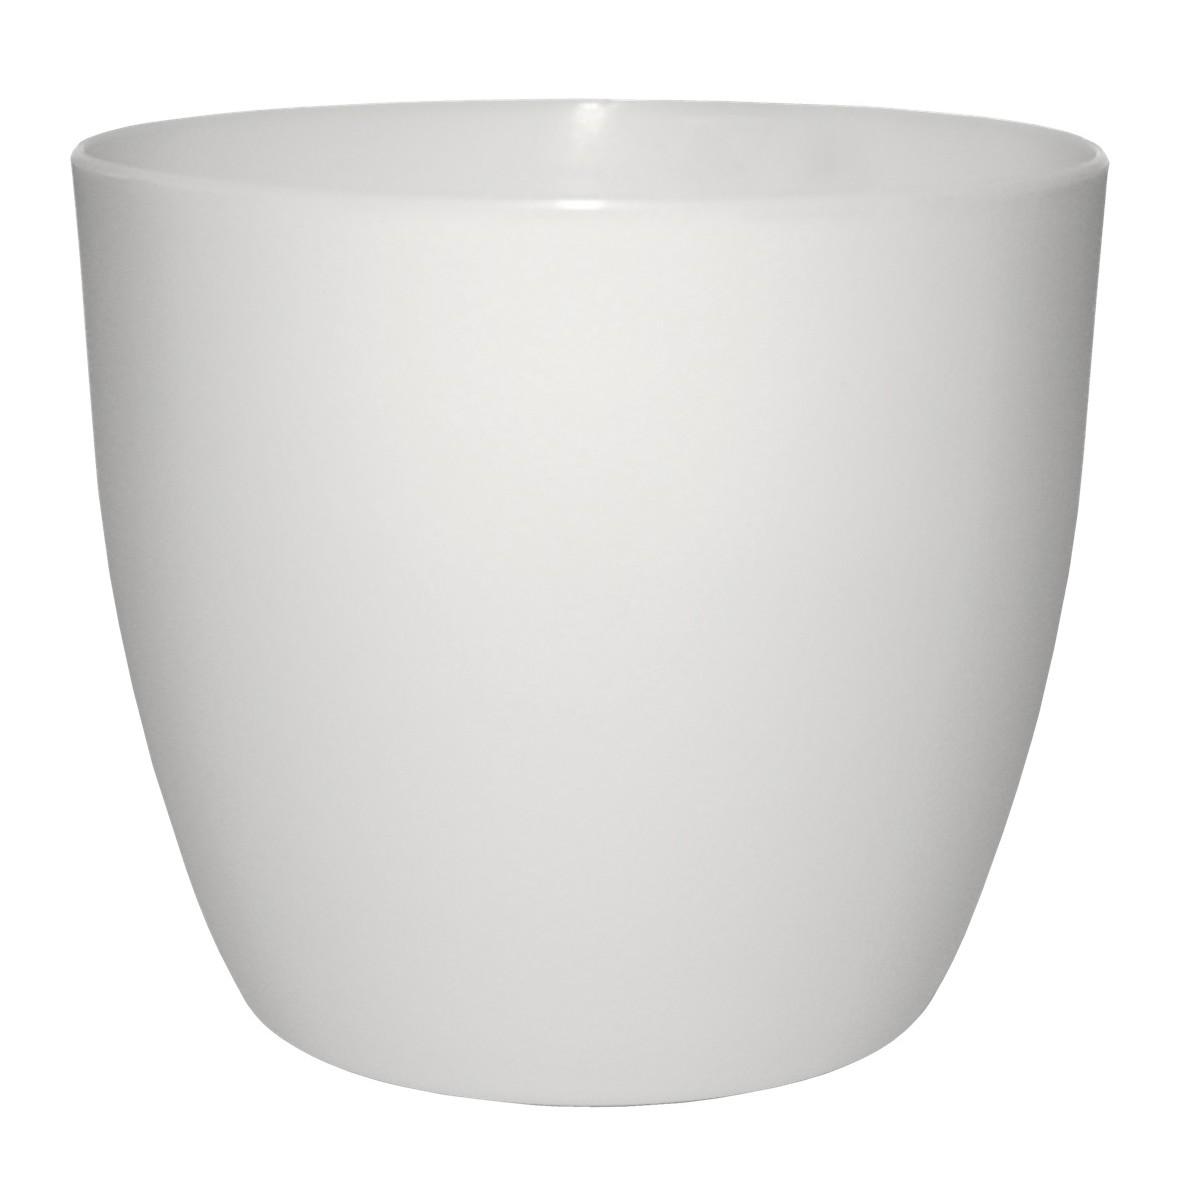 Vaso para Plantas Plastico 12cm Musique Branco VPMRB11 - Japi